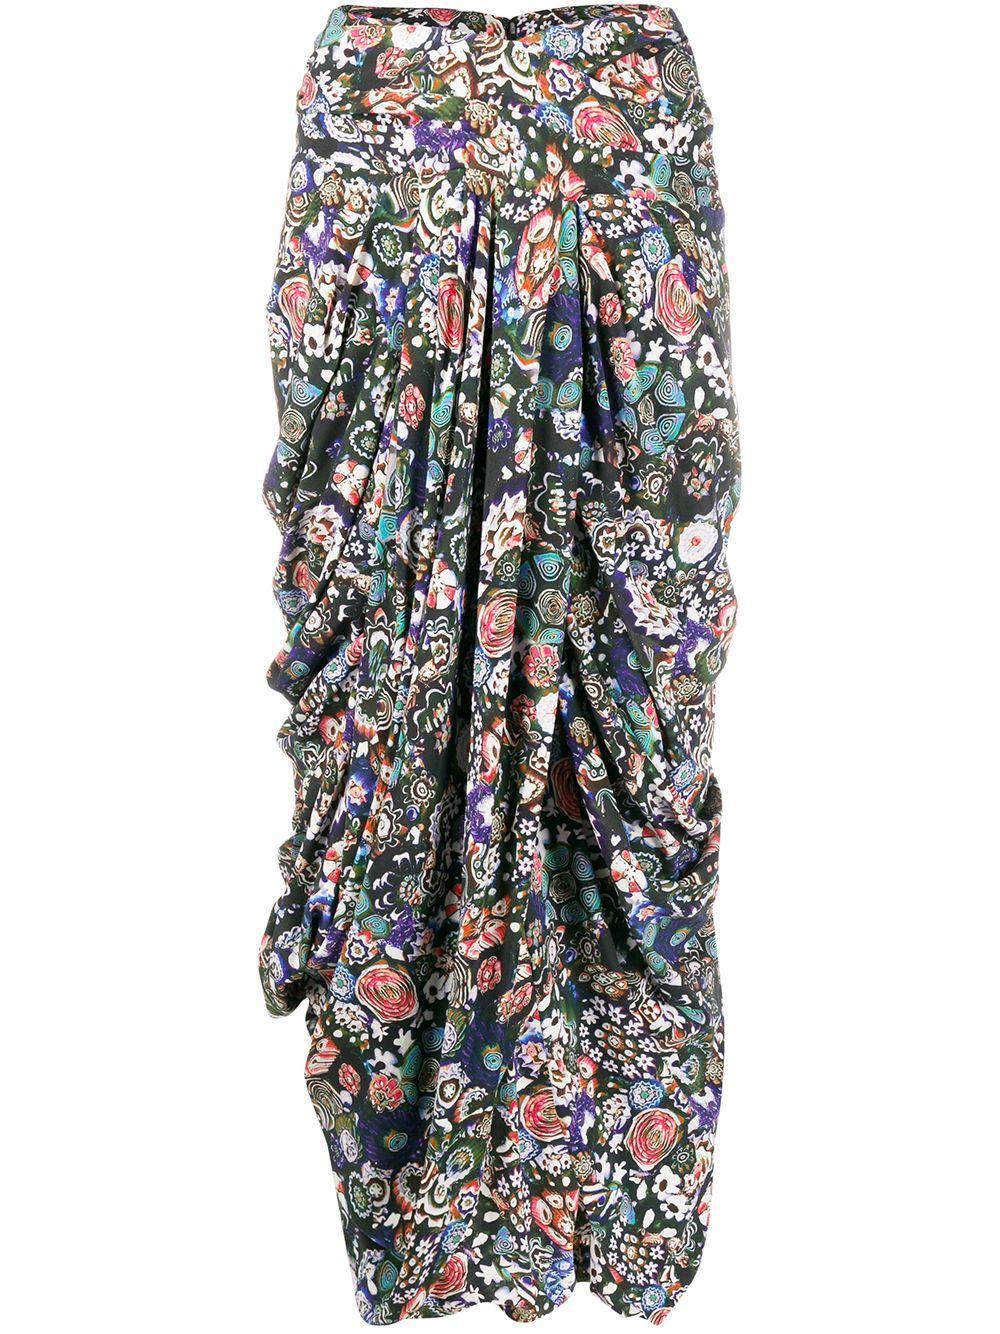 Isabel Marant юбка с запахом и принтом